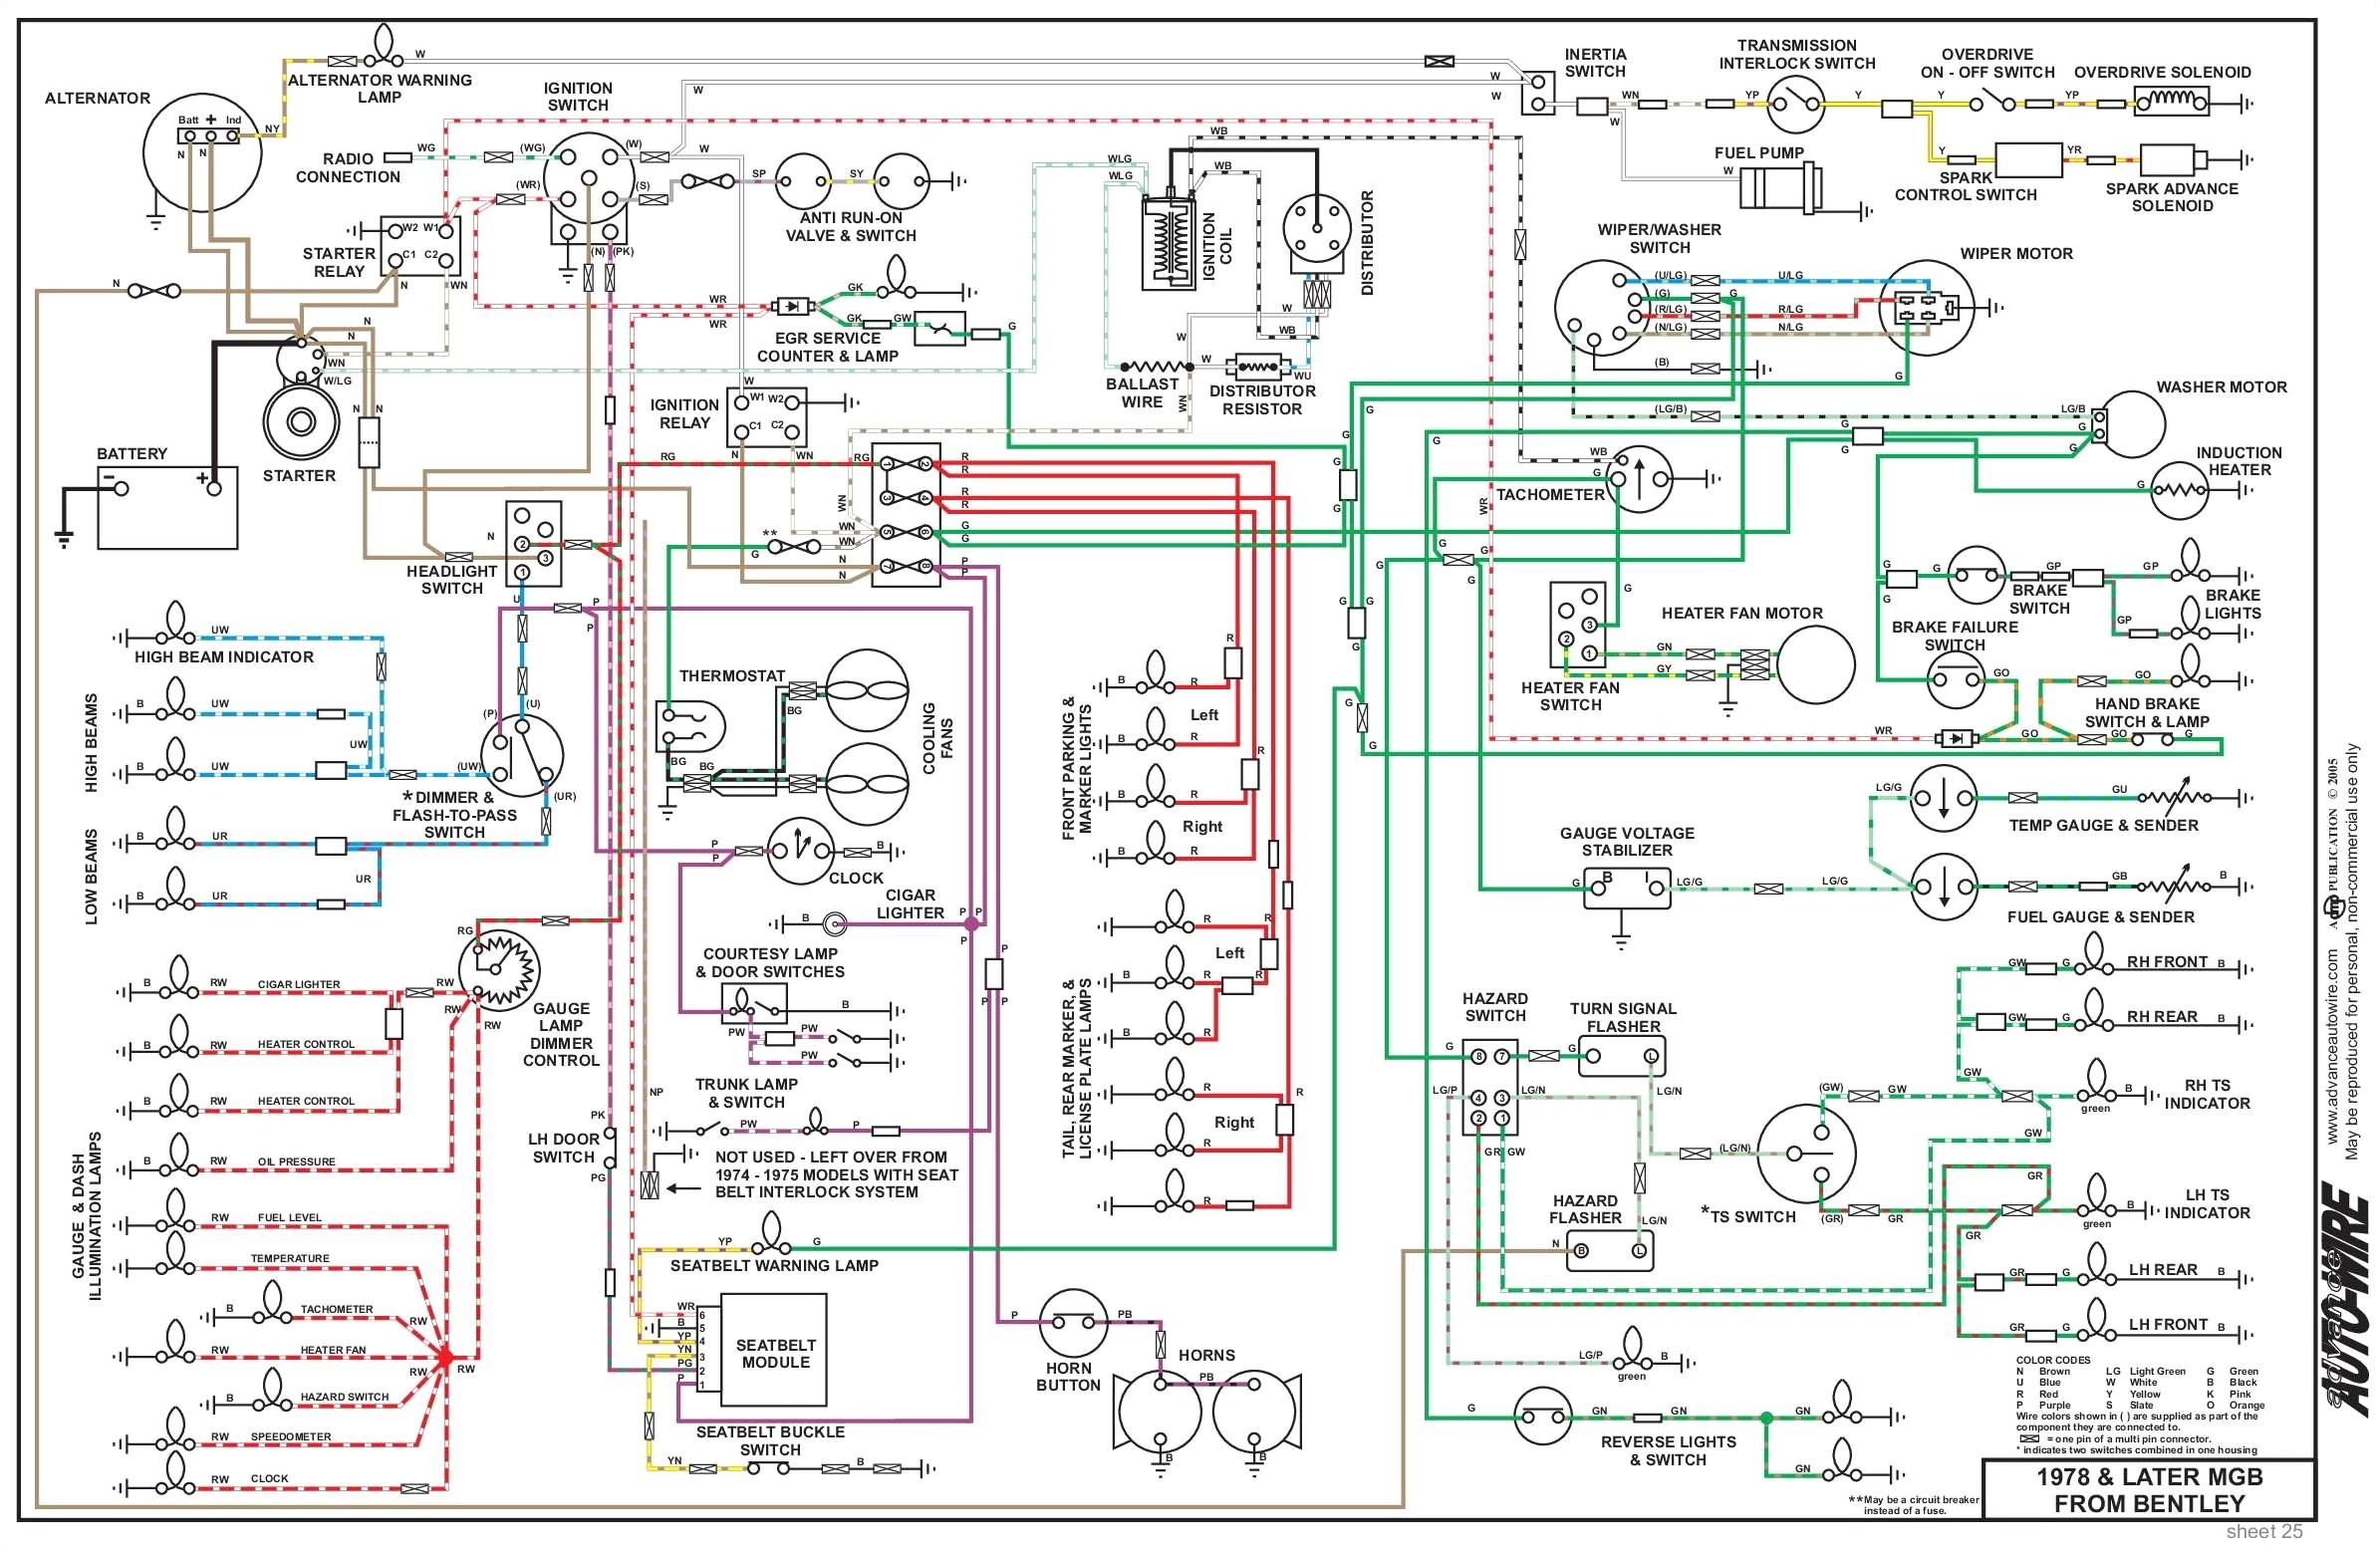 1972 Corvette Wiring Diagram Mgb Wiring Harness Diagrams Wiring Diagram Split